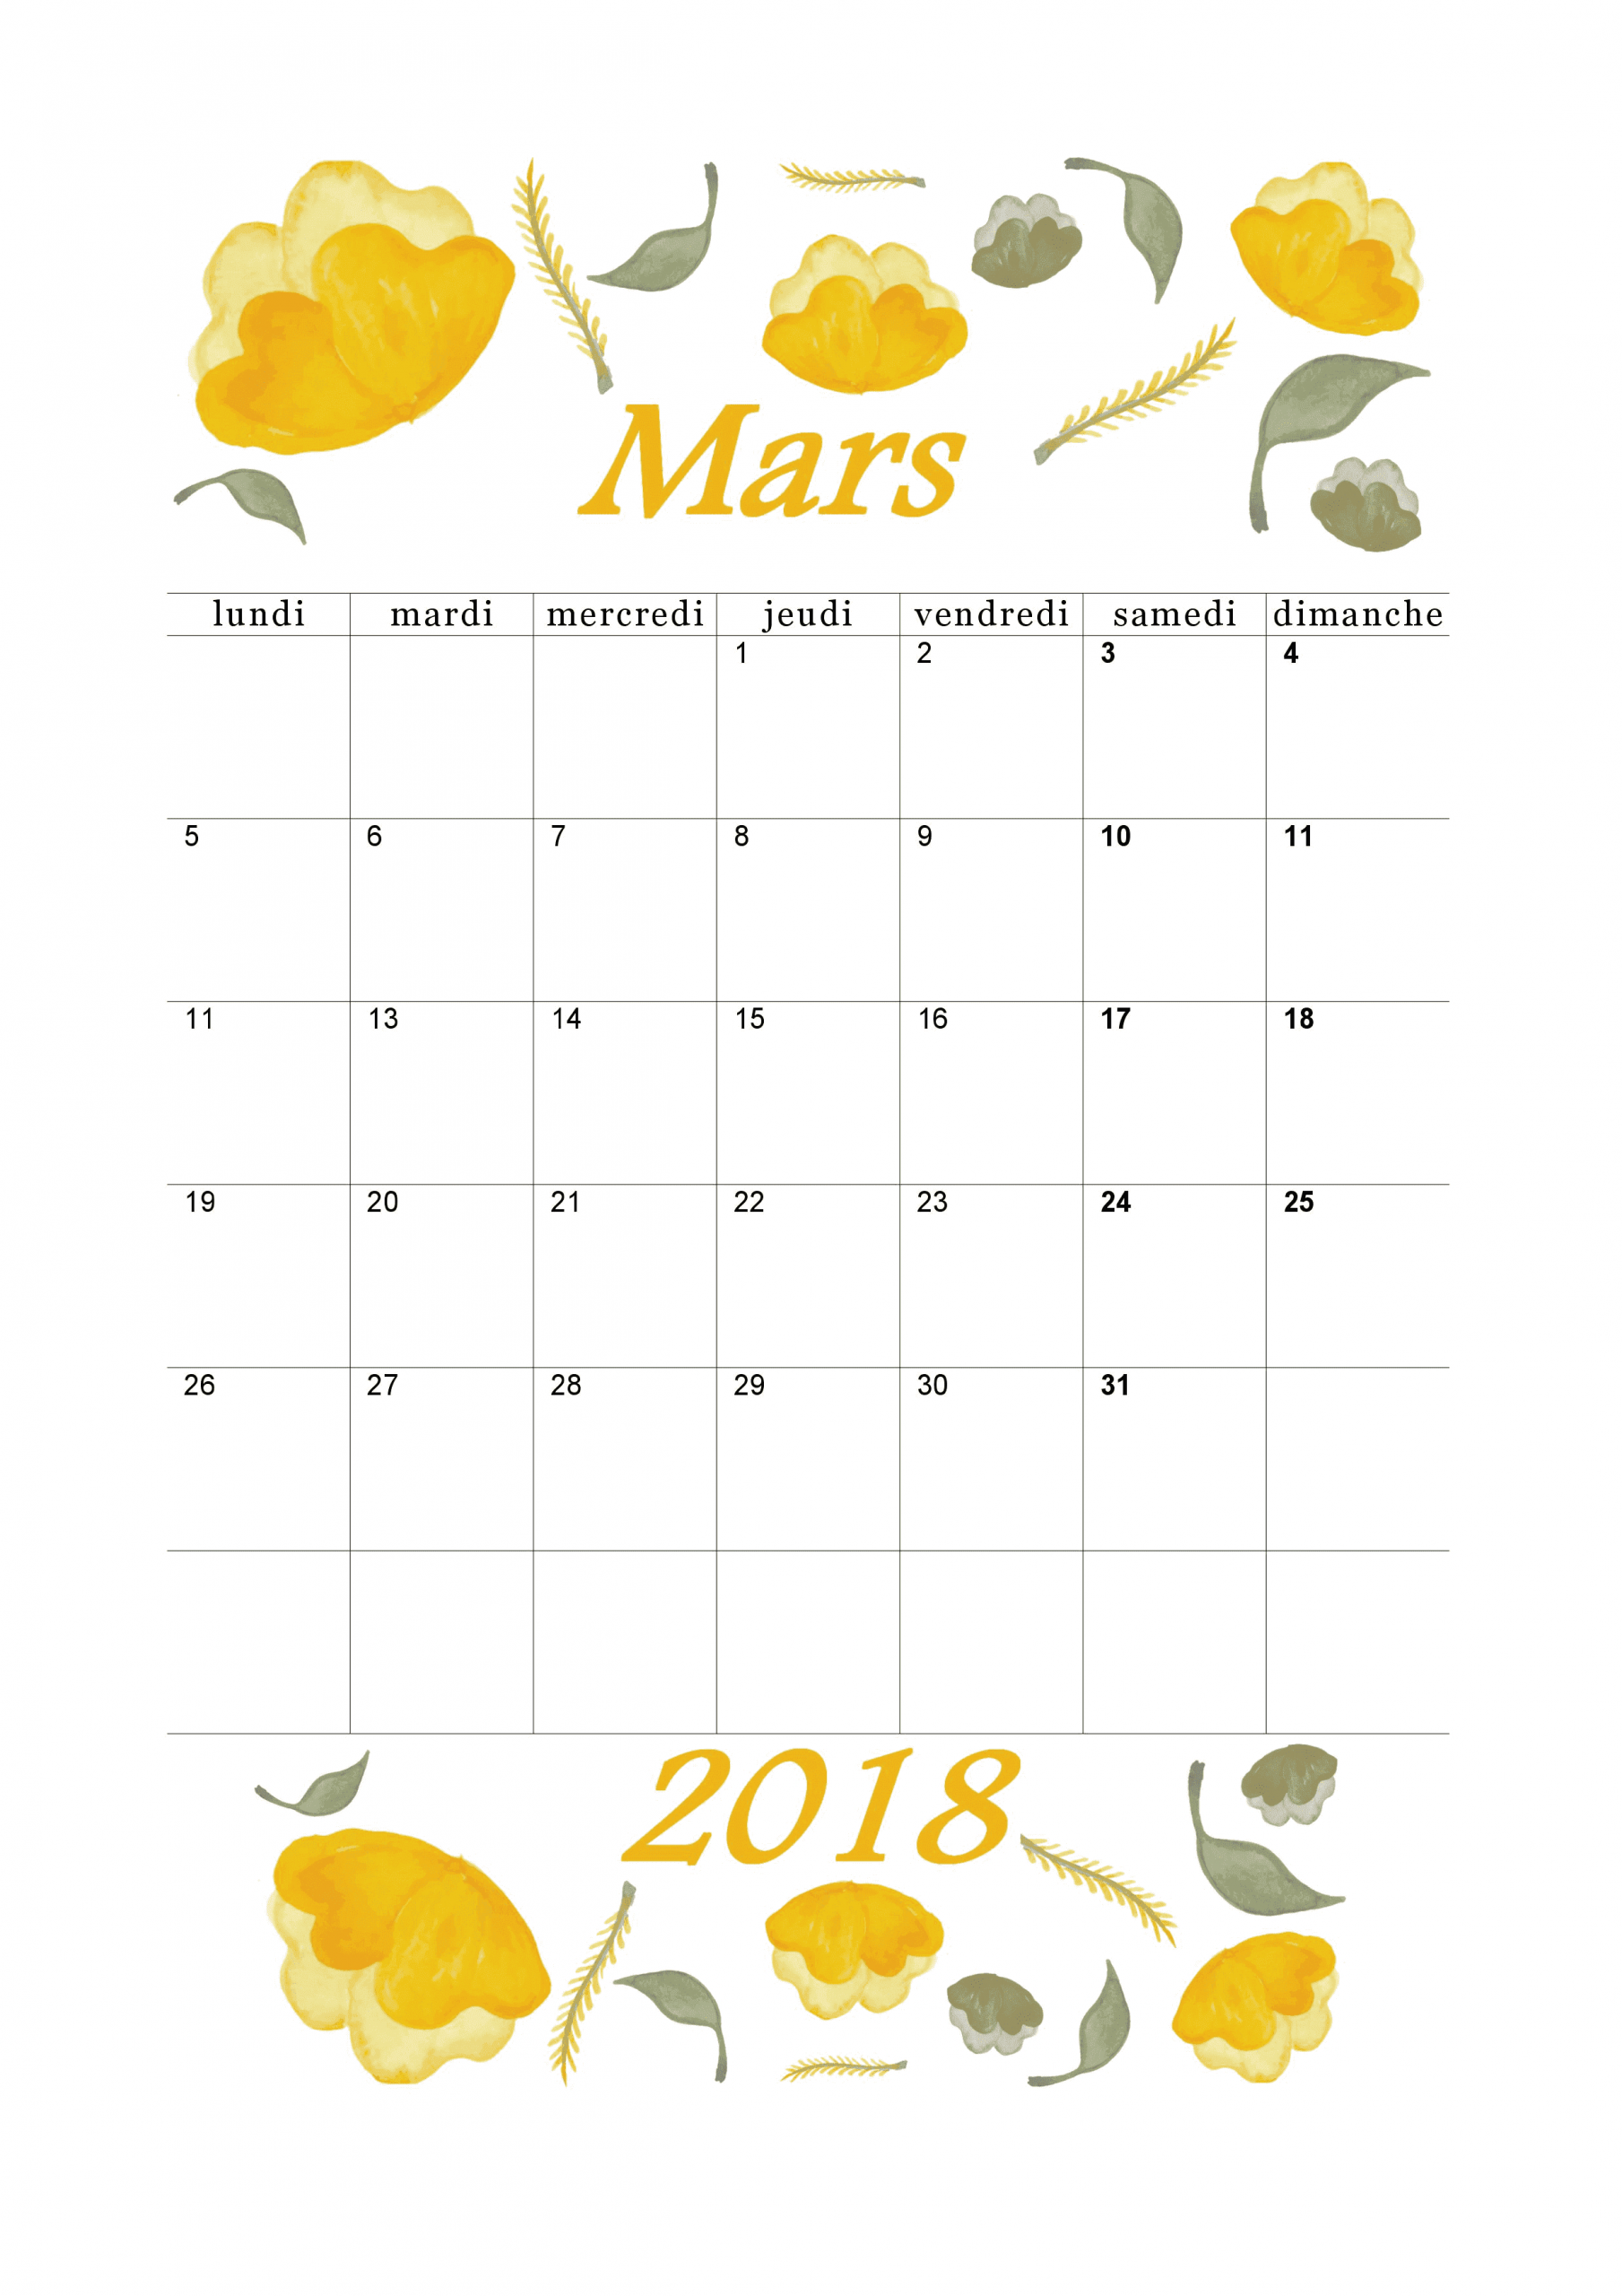 Calendrier Mars 2018 À Imprimer - Calendriers Imprimables intérieur Calendrier Mars 2018 À Imprimer